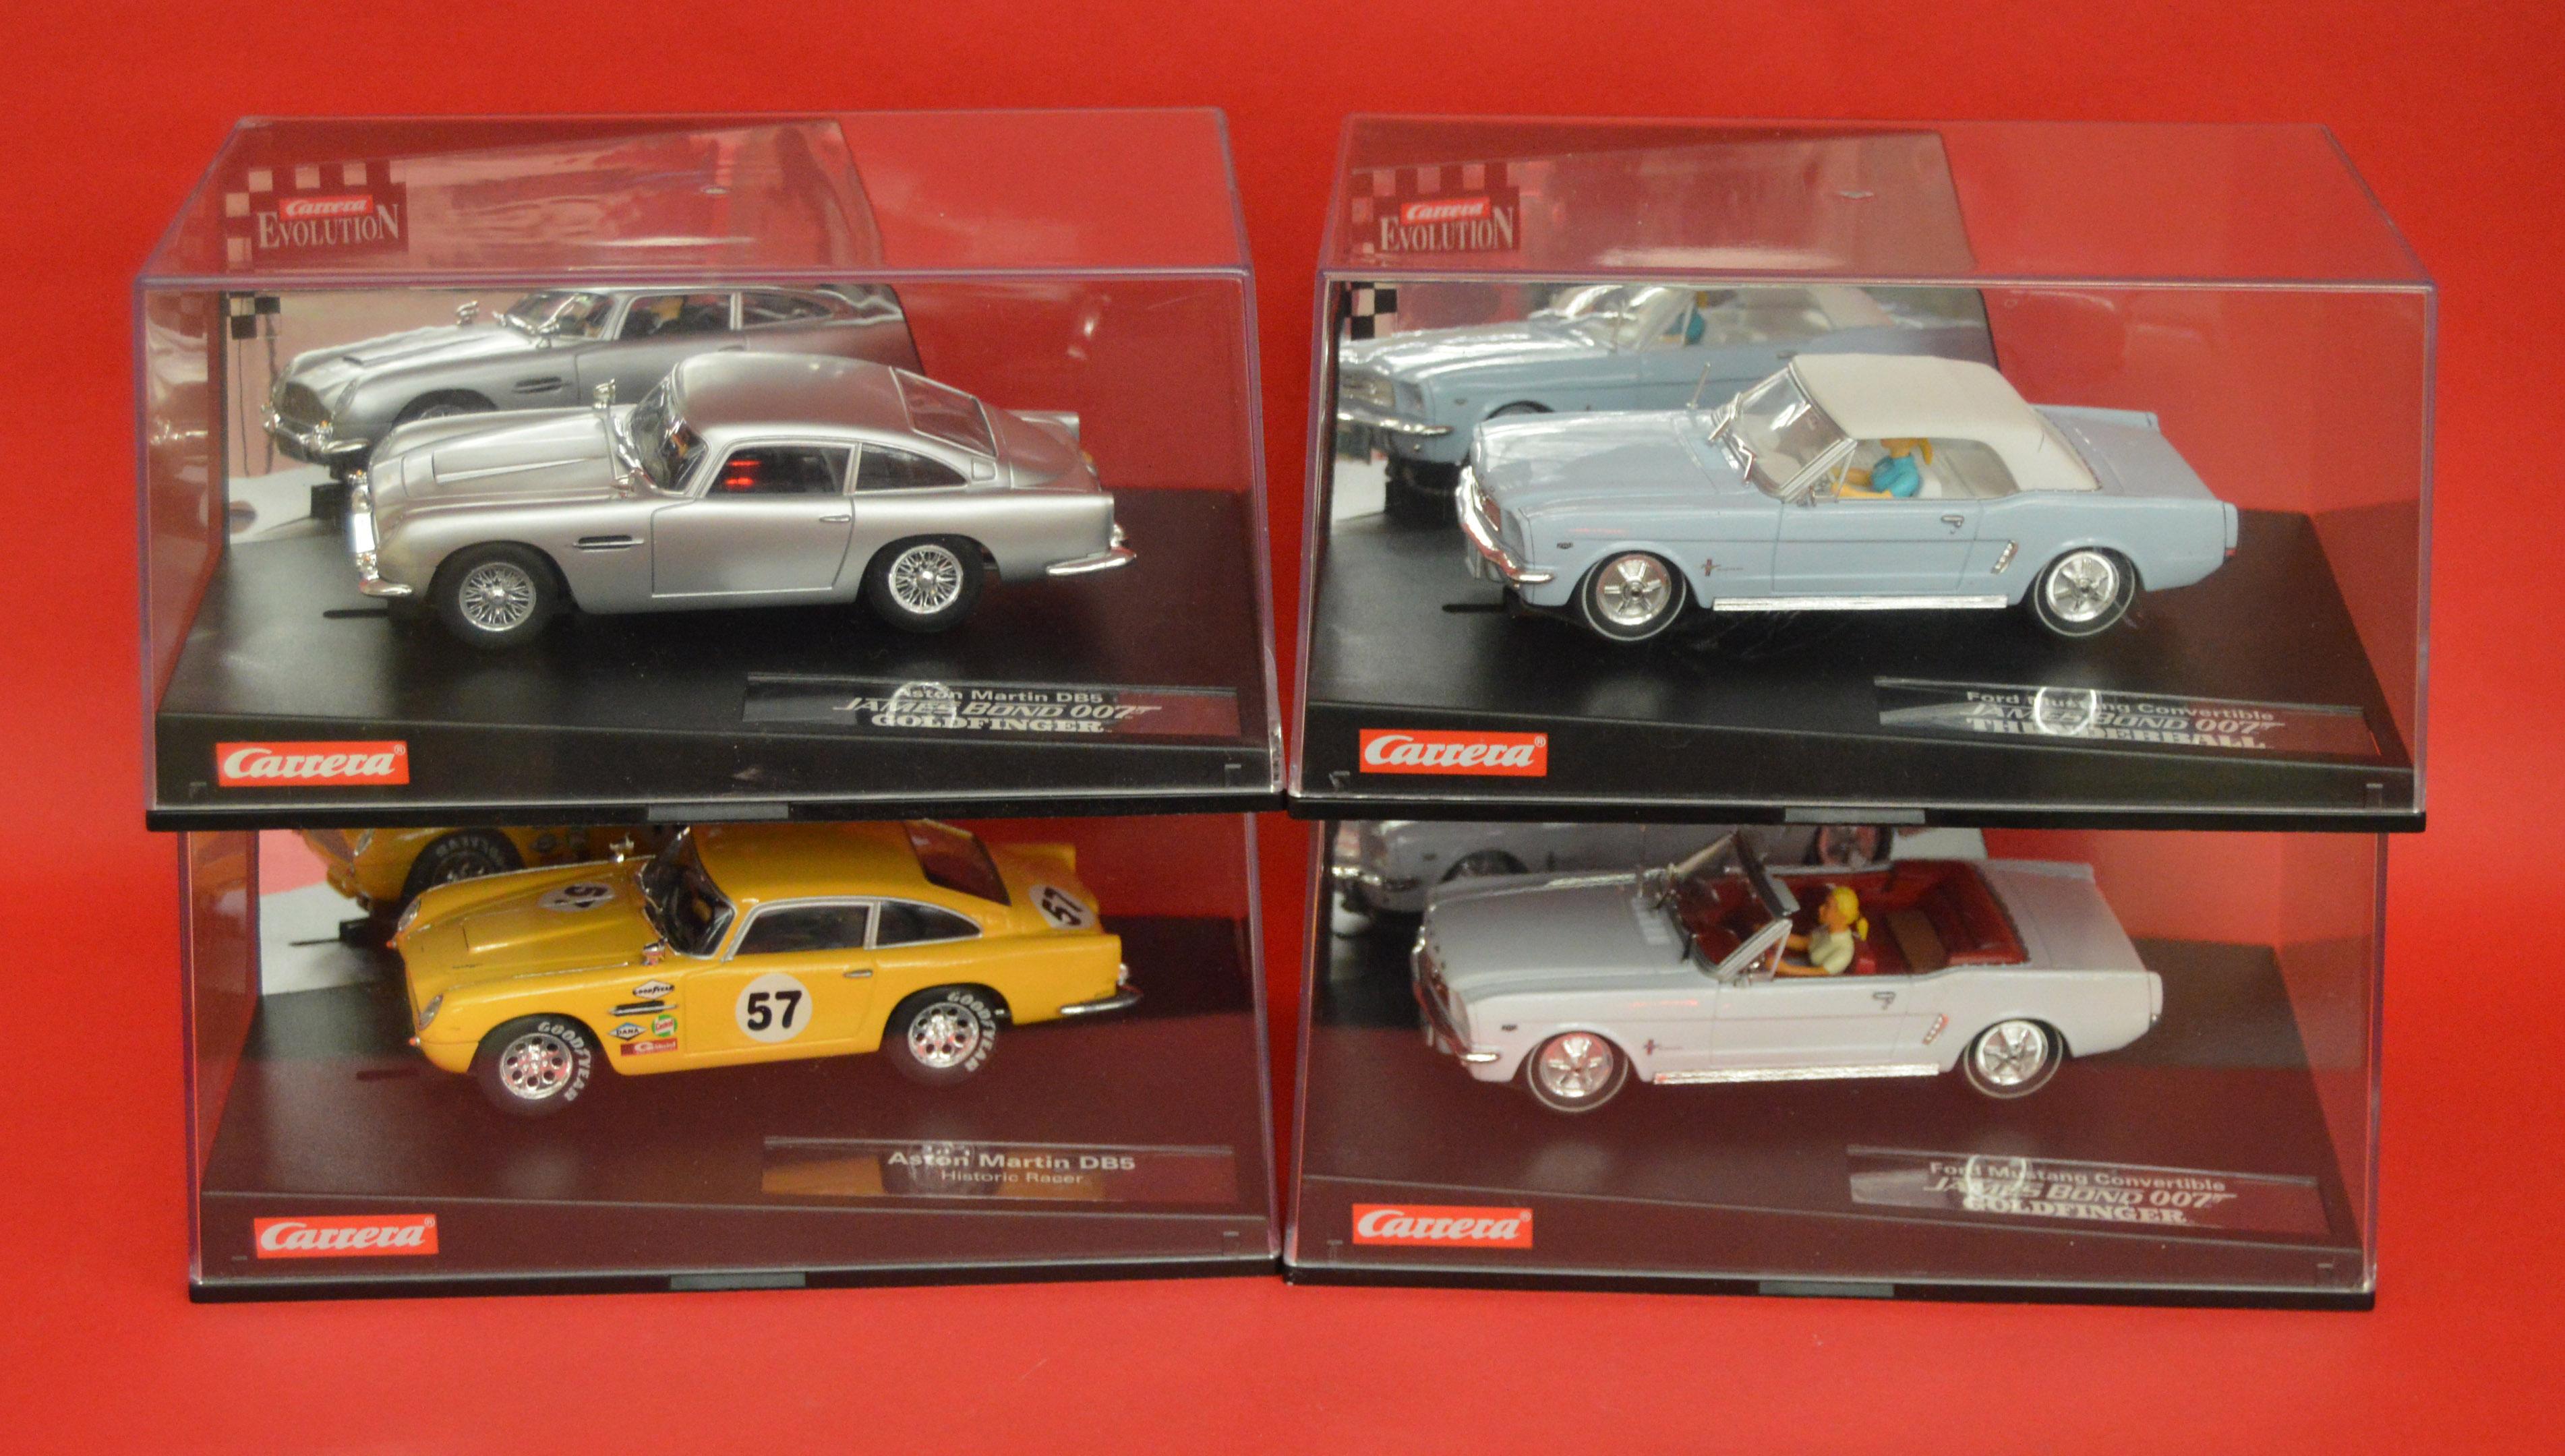 Evolution slot cars